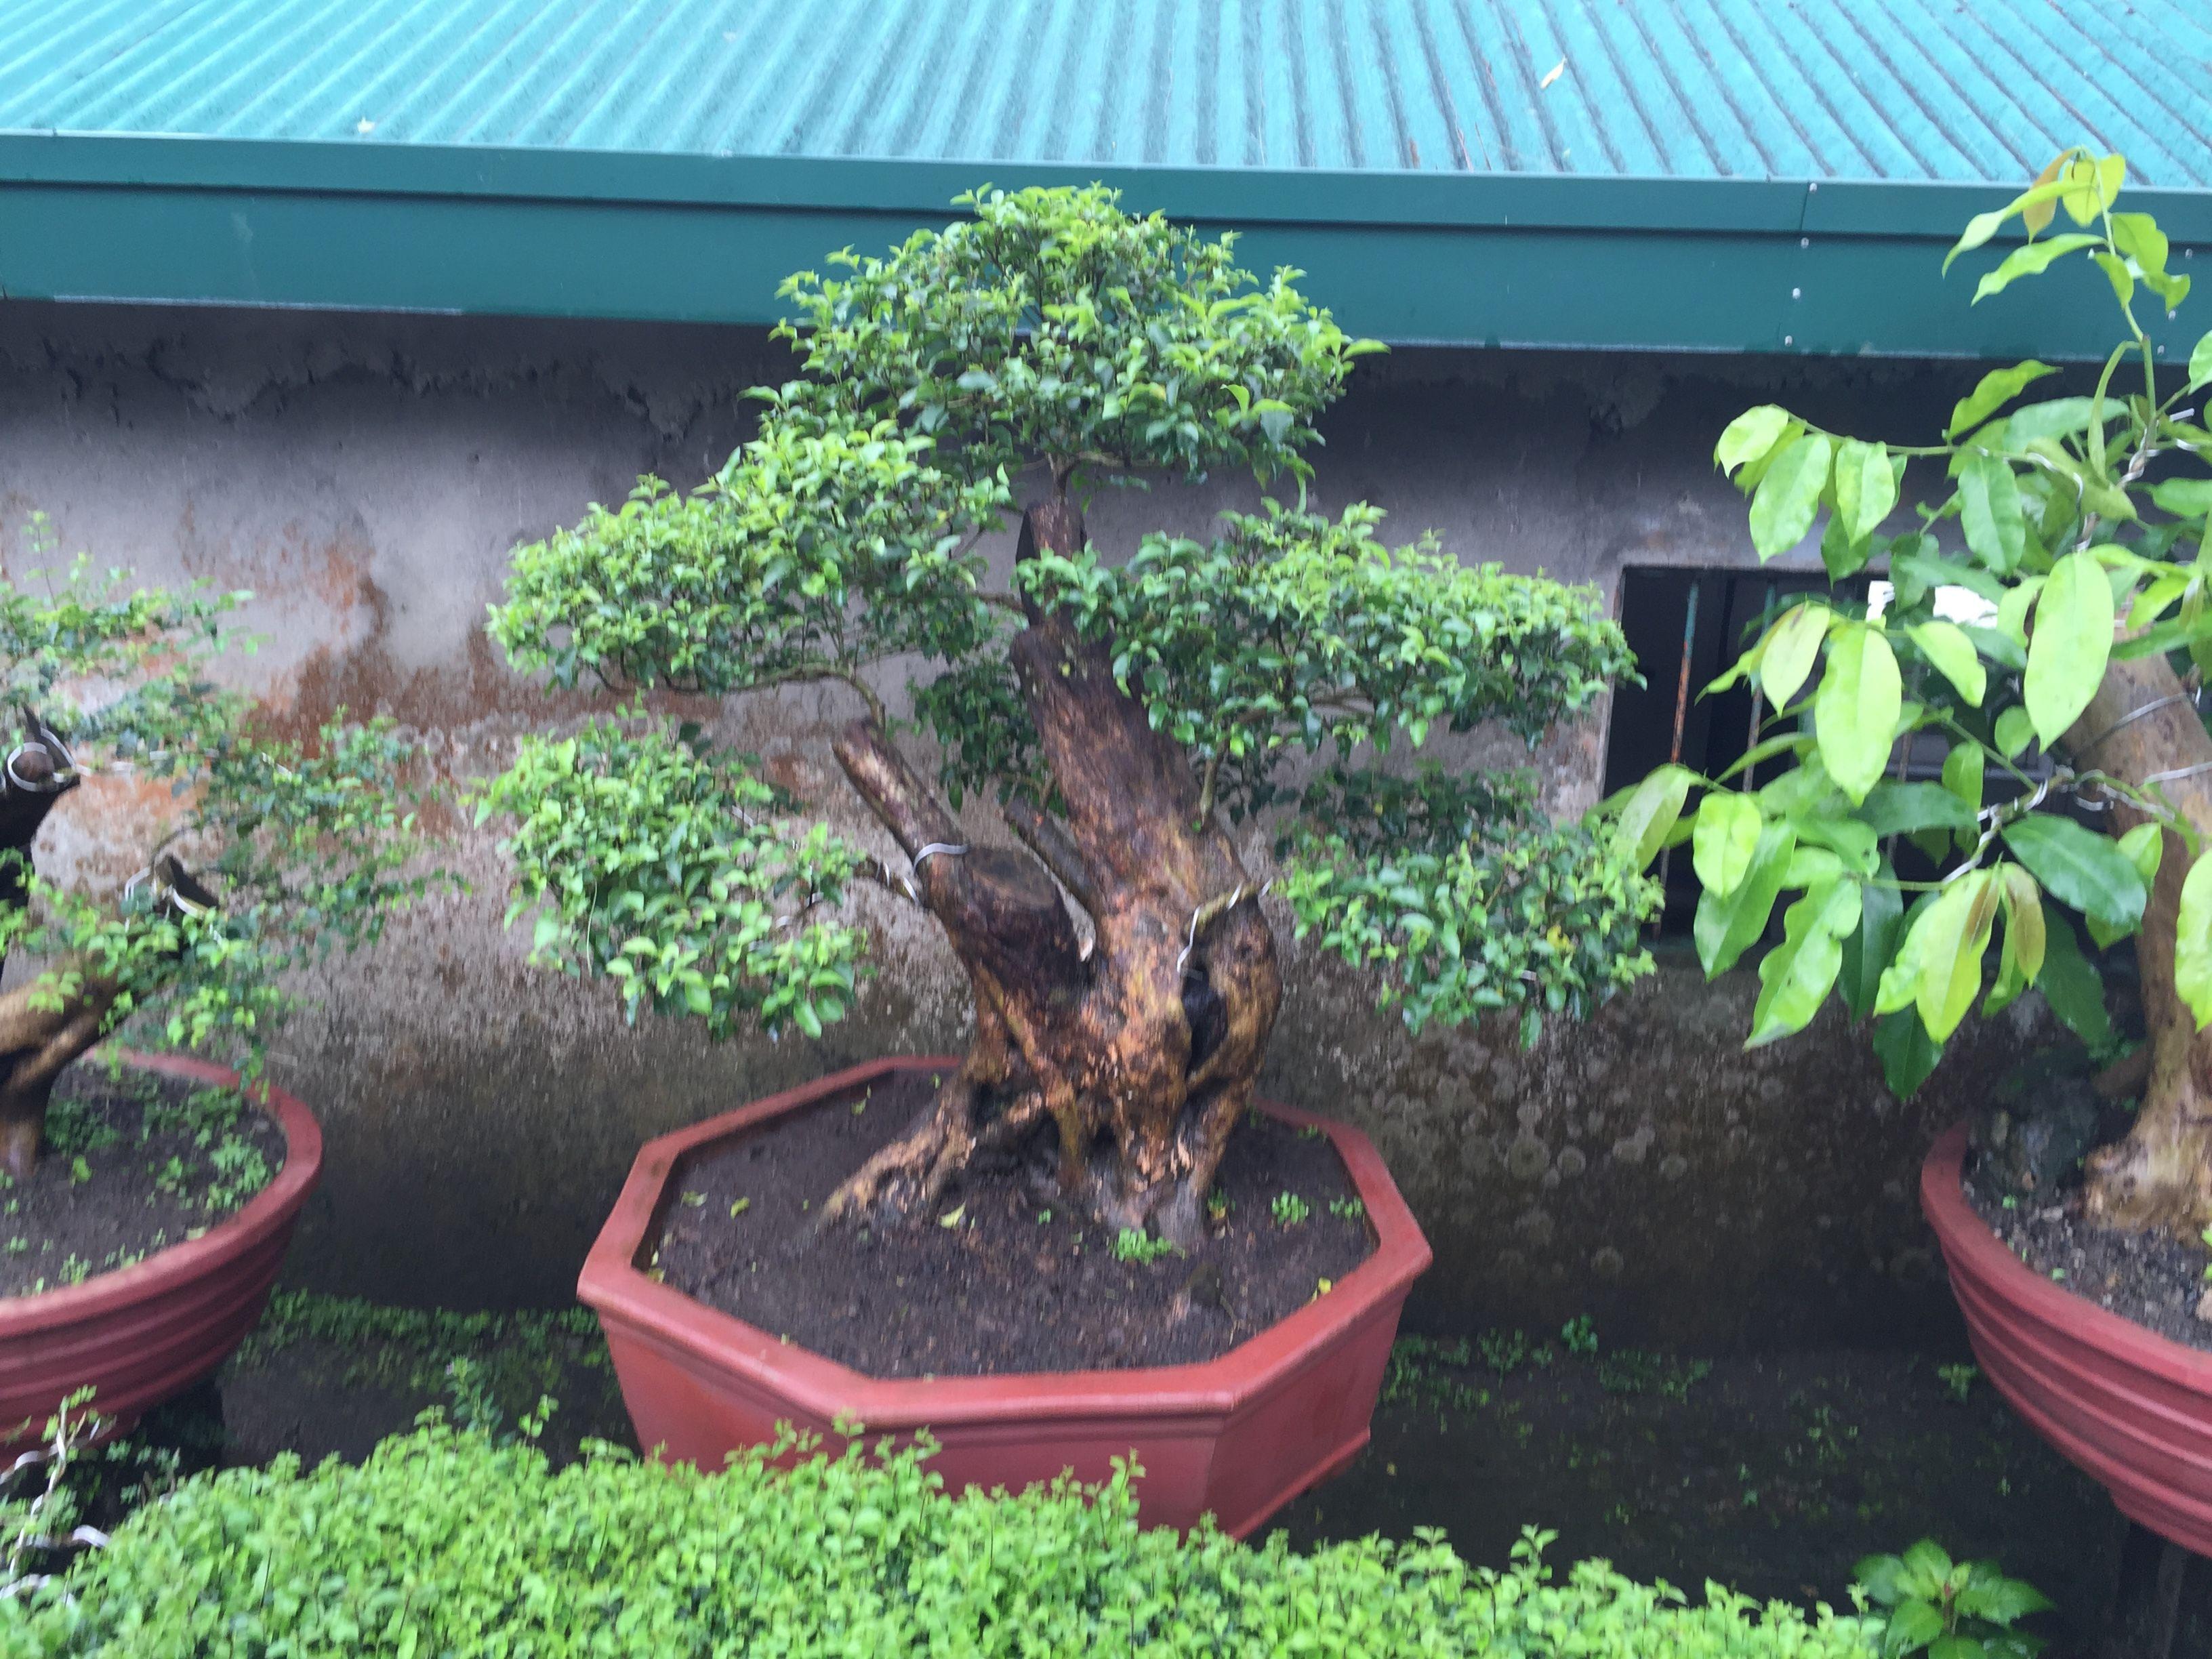 Roadside bonsai sales, Tagaytay, Philippines